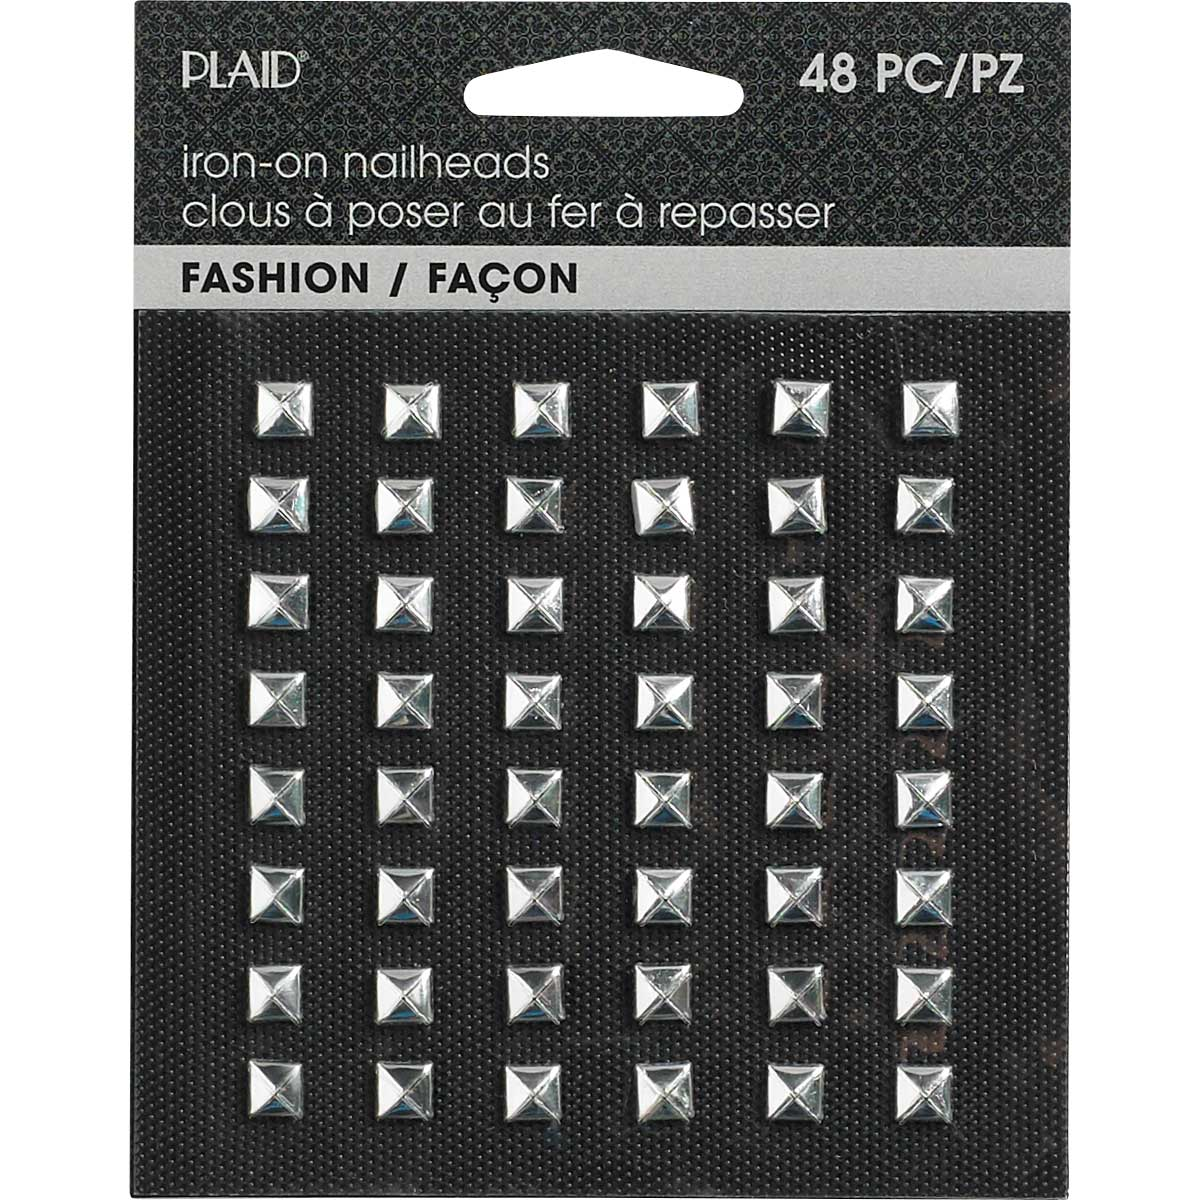 Plaid ® Hot Fix Nailhead Iron-Ons - Pyramid Shiny Silver - 71031